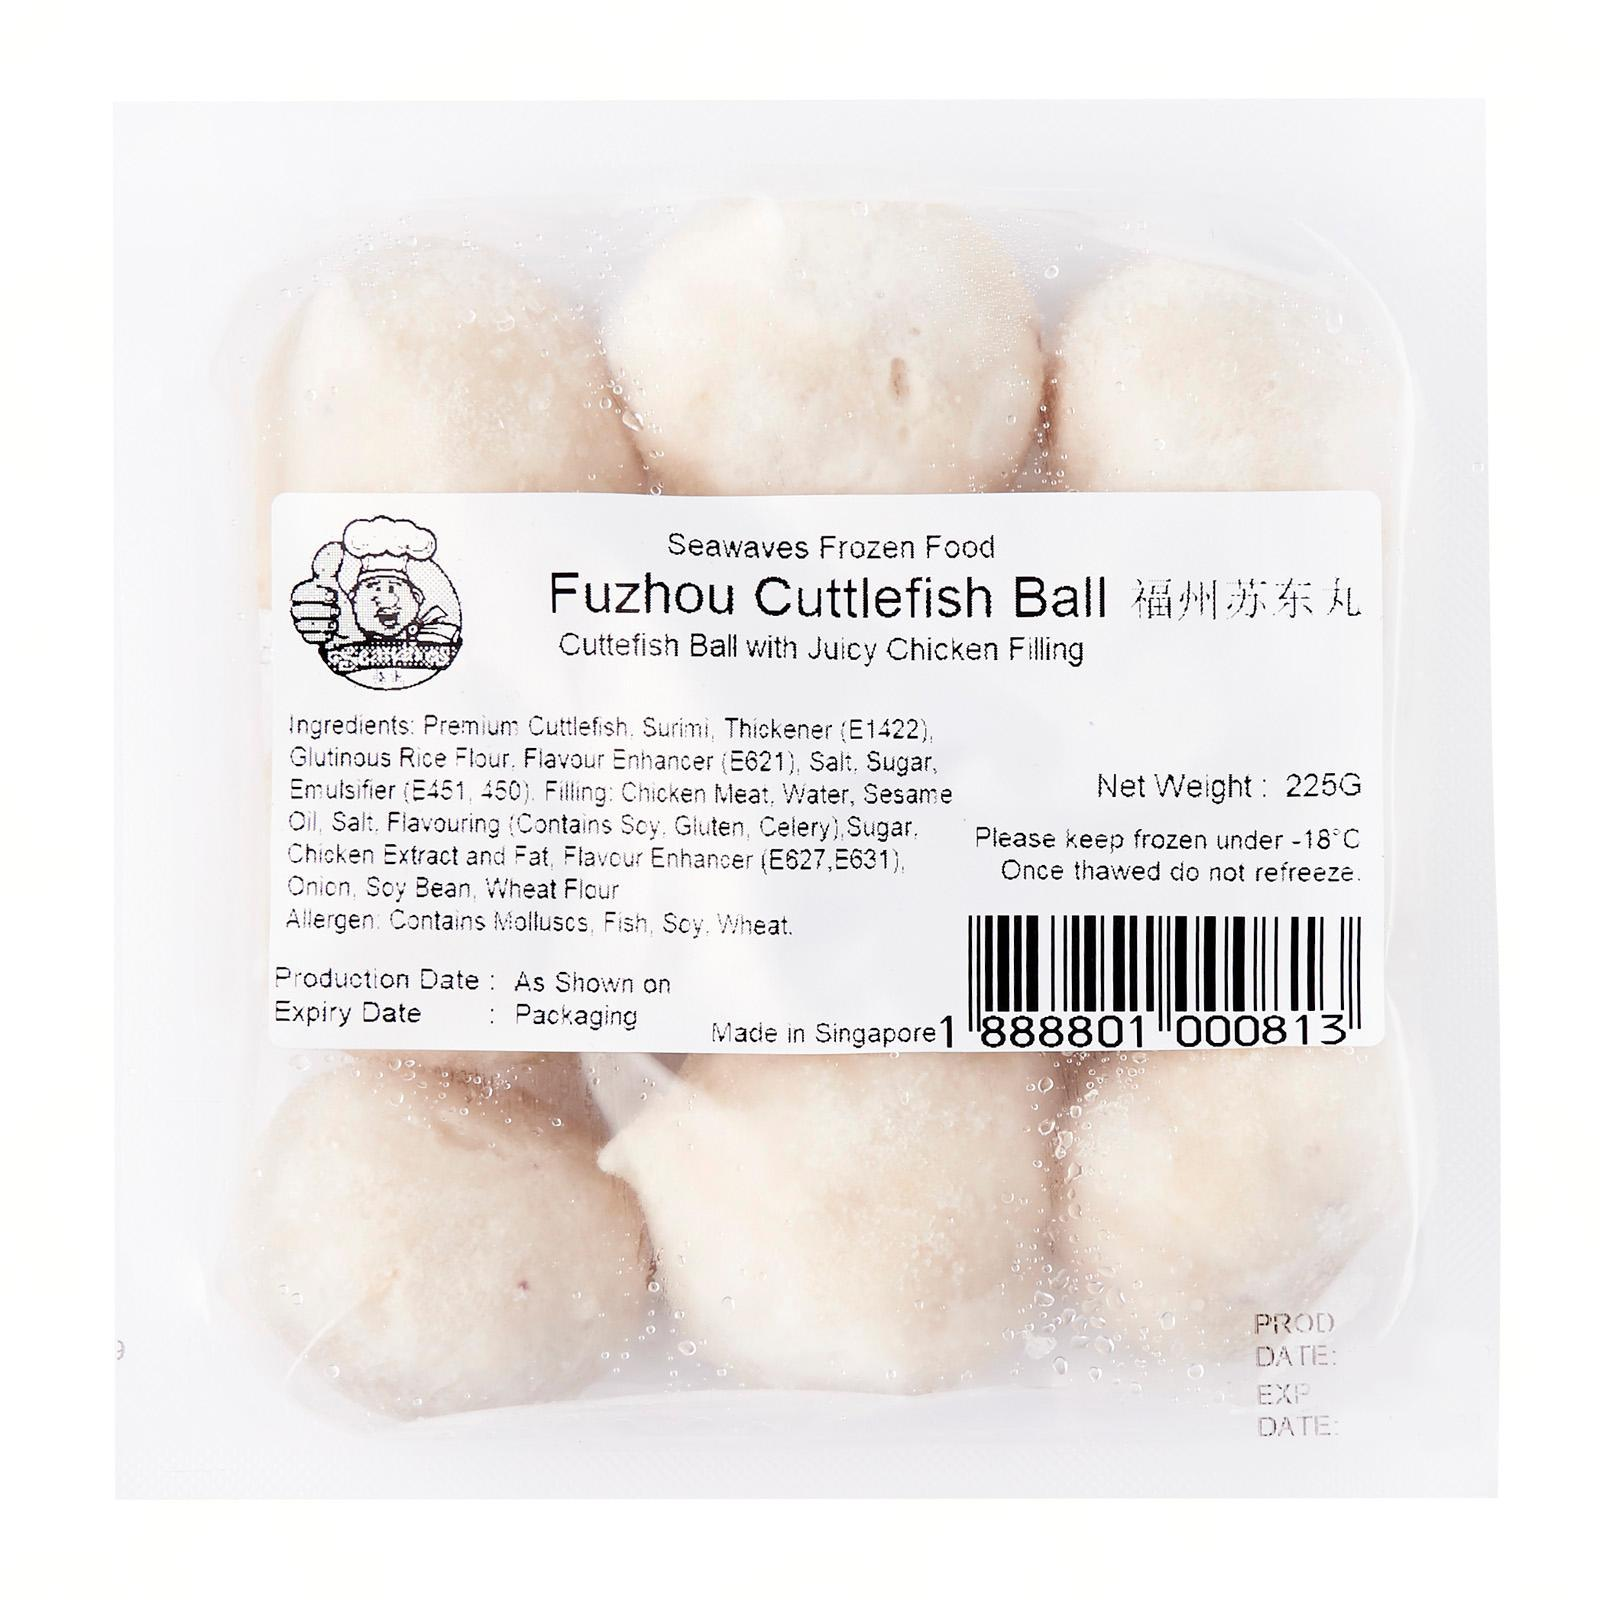 Seawaves Fuzhou Cuttlefish Ball - Frozen